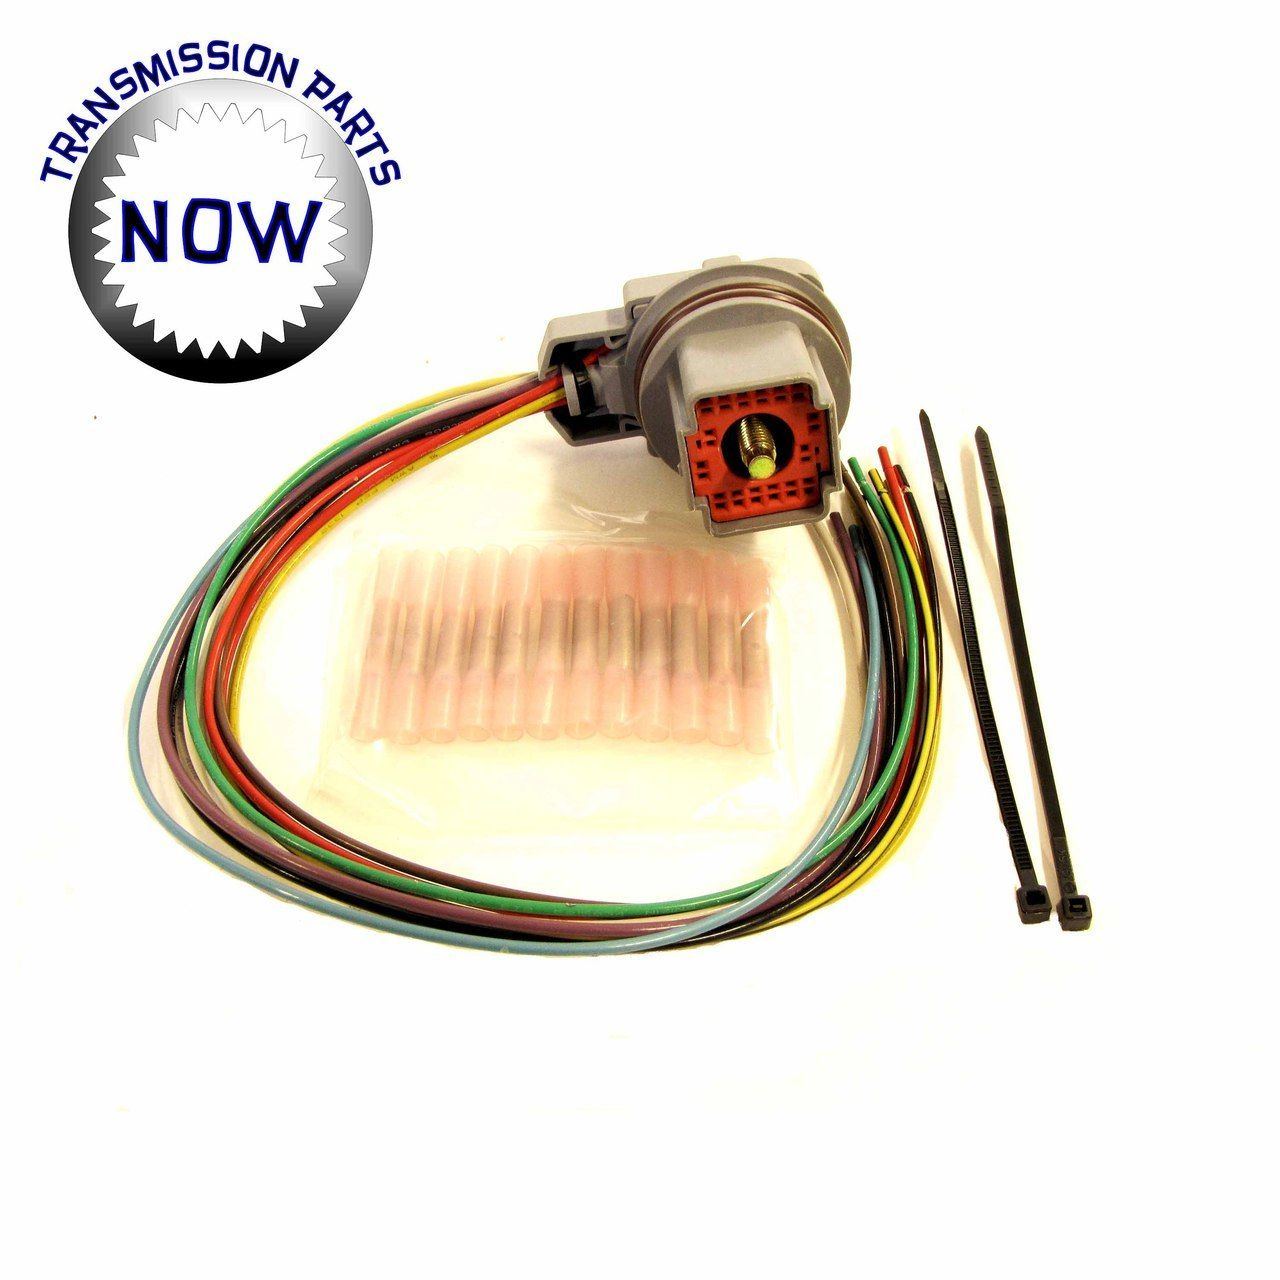 medium resolution of 5r55w 5r55s solenoid connector repair kit